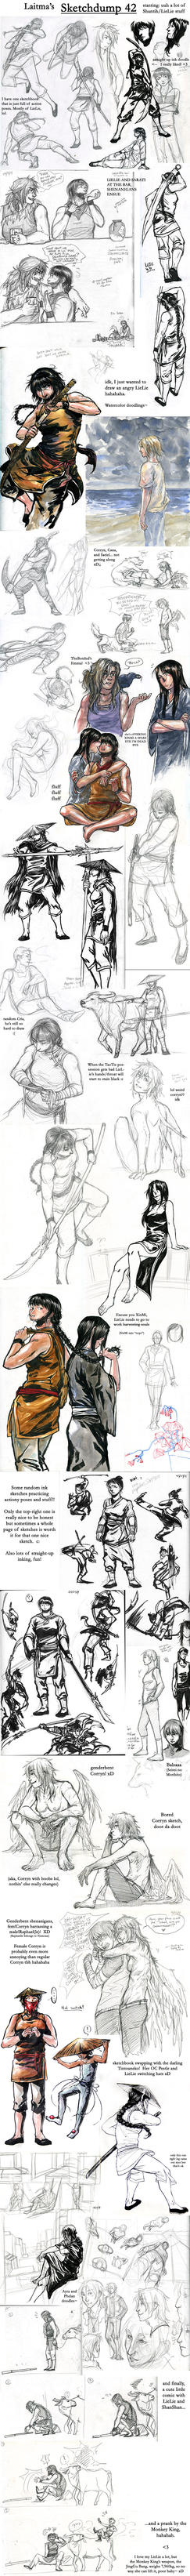 Sketchdump 42 by Laitma